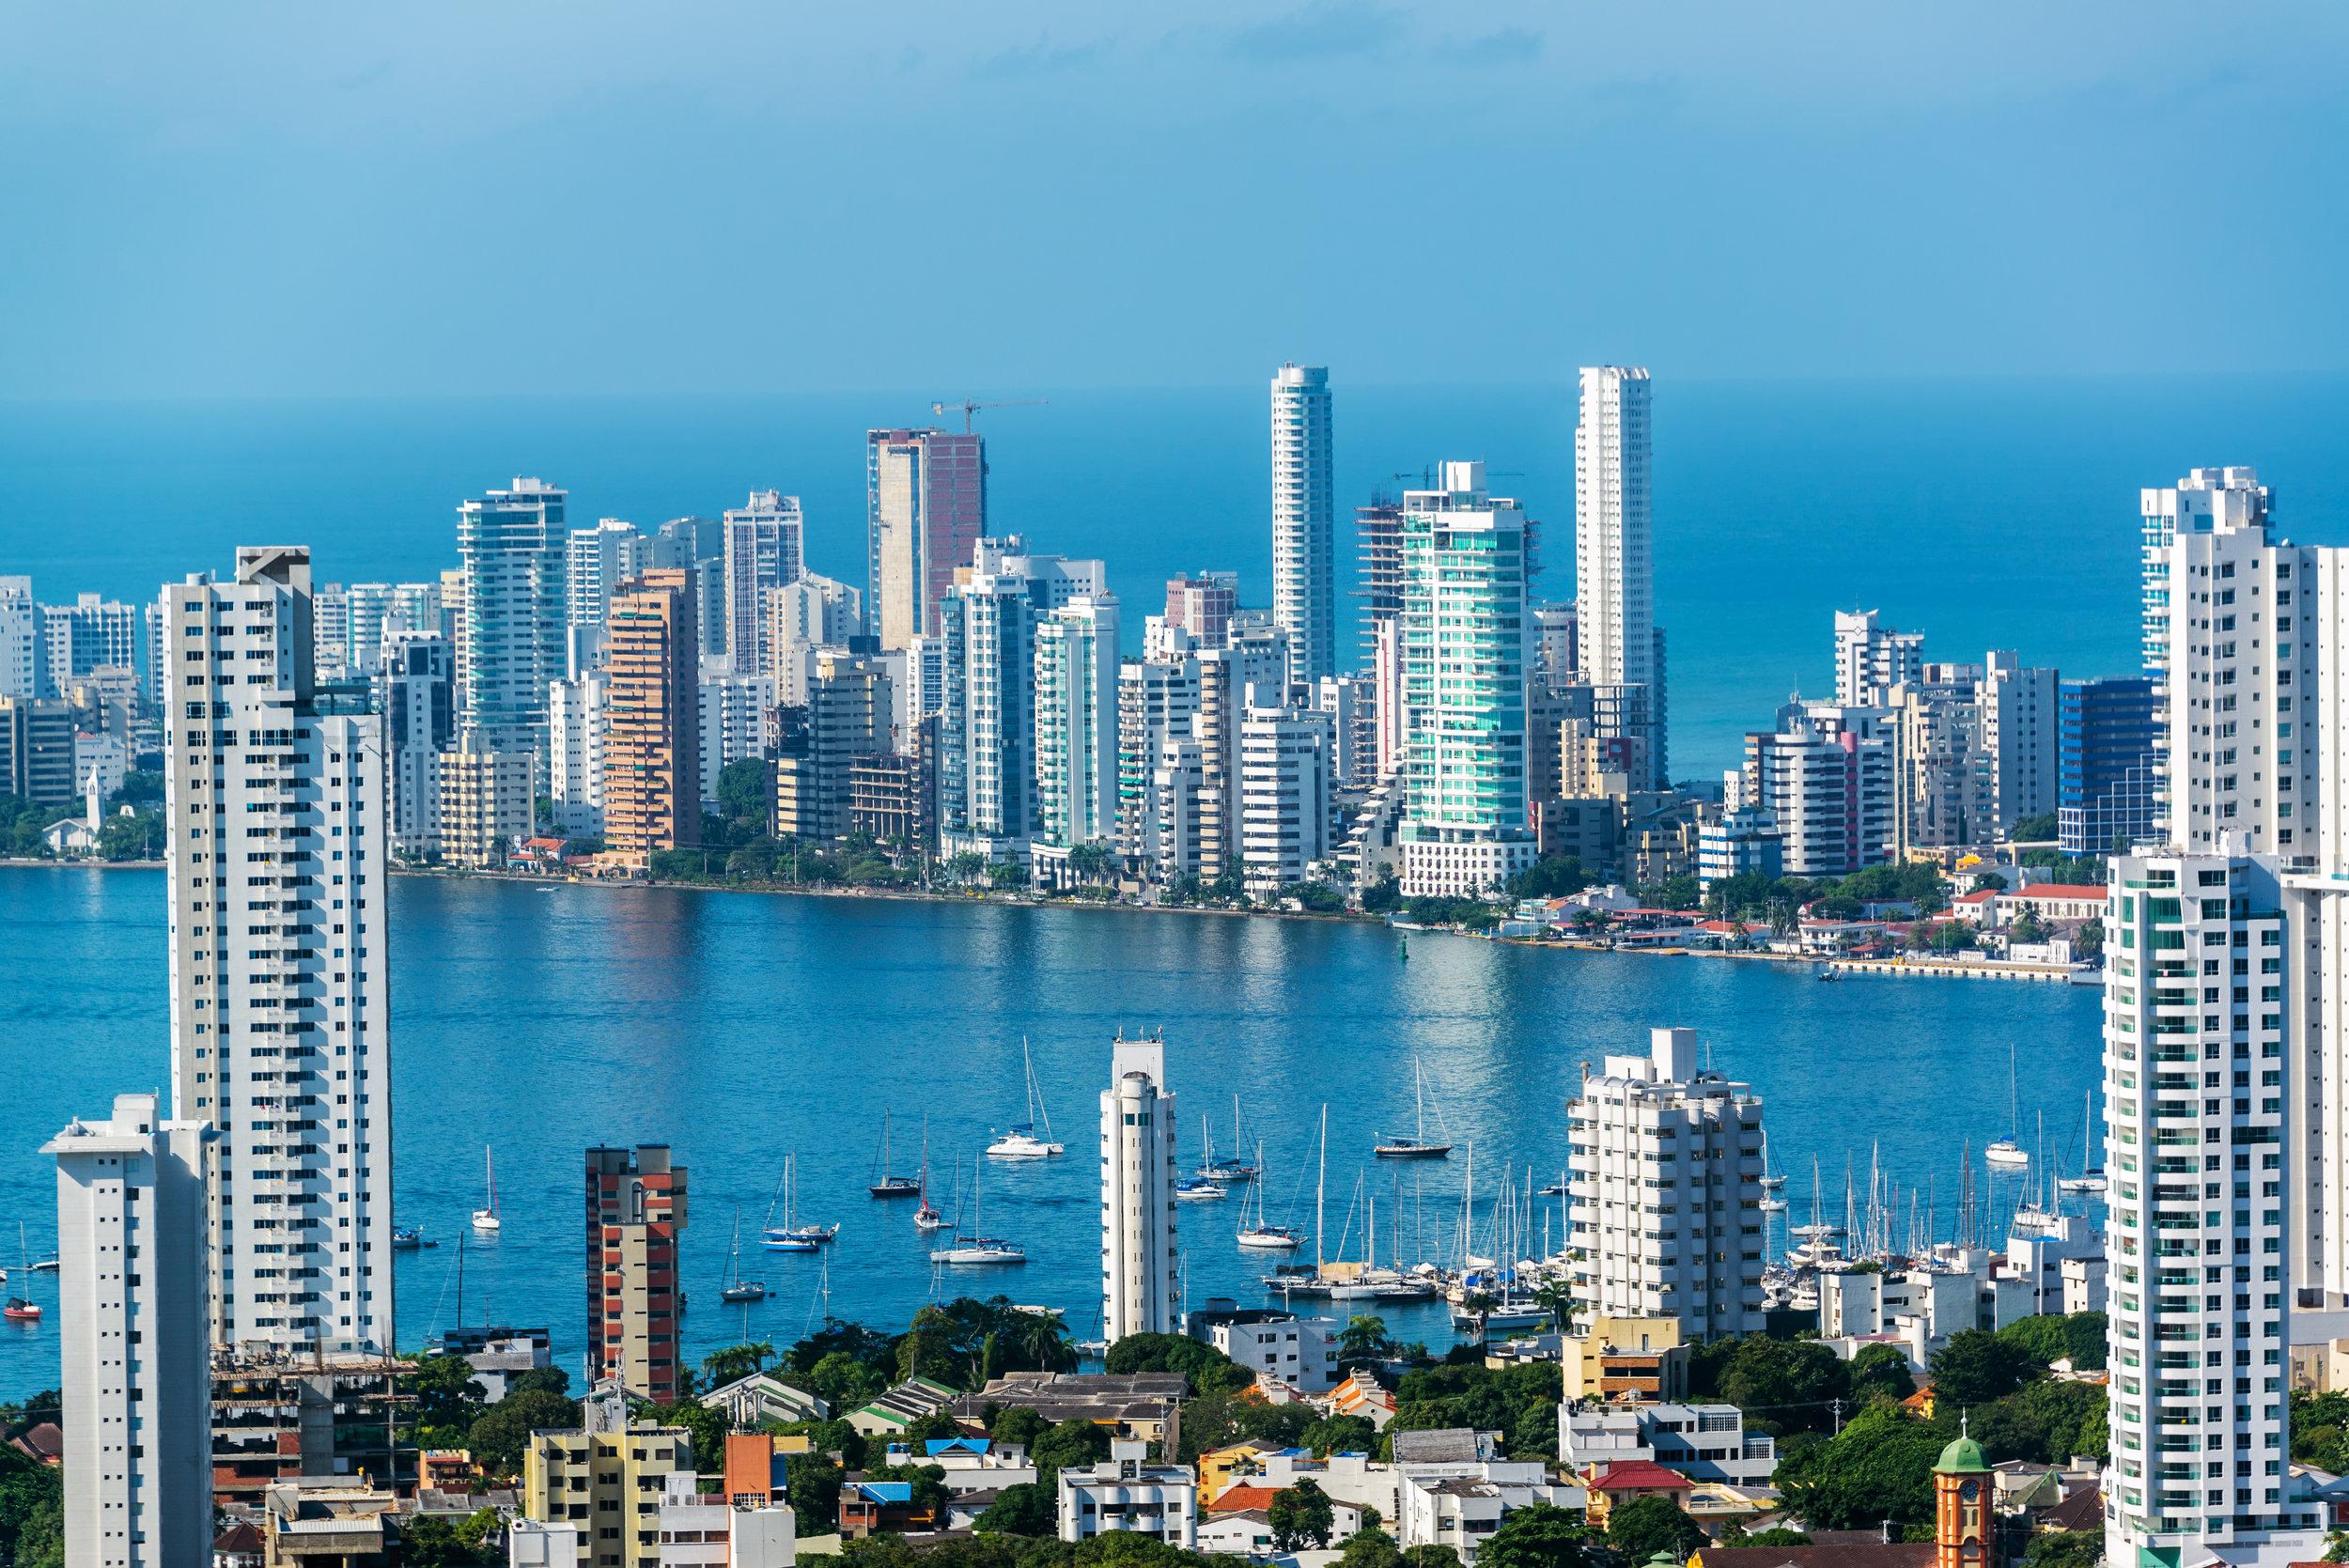 colombia_bigstock-Cartagena-Skyscapers-55221812.jpg